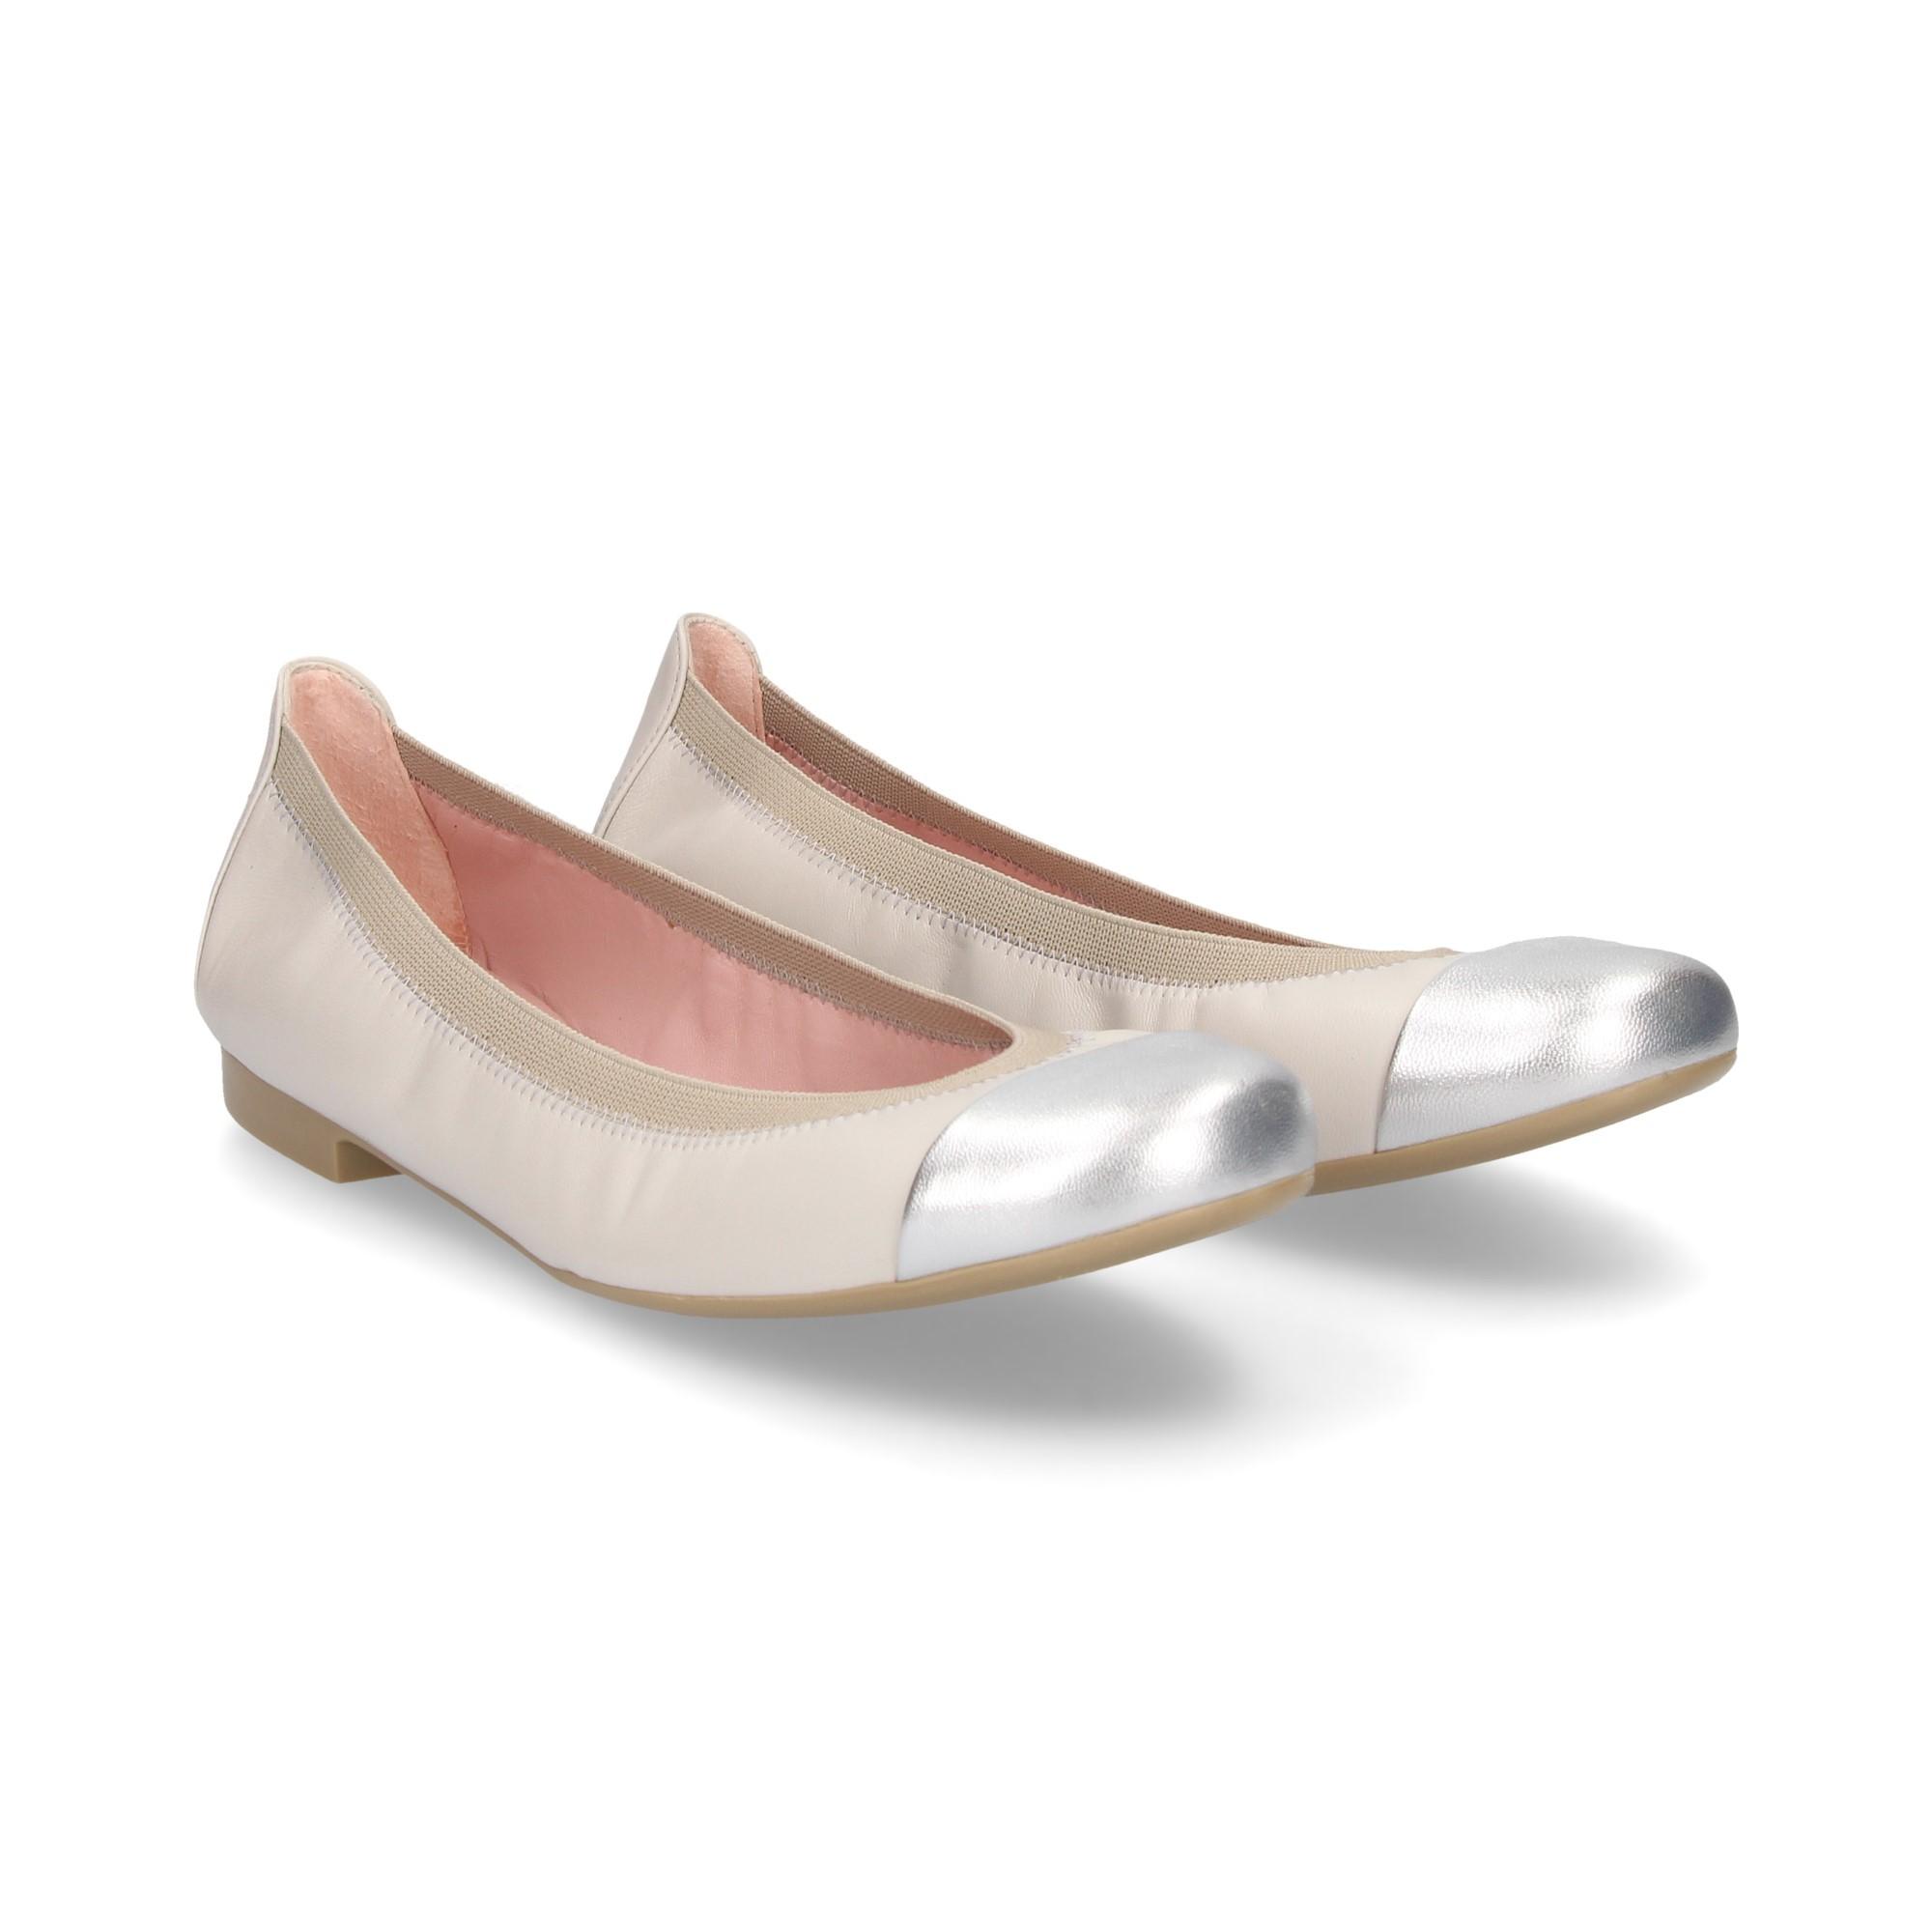 bailarina-elastico-hielo-plata